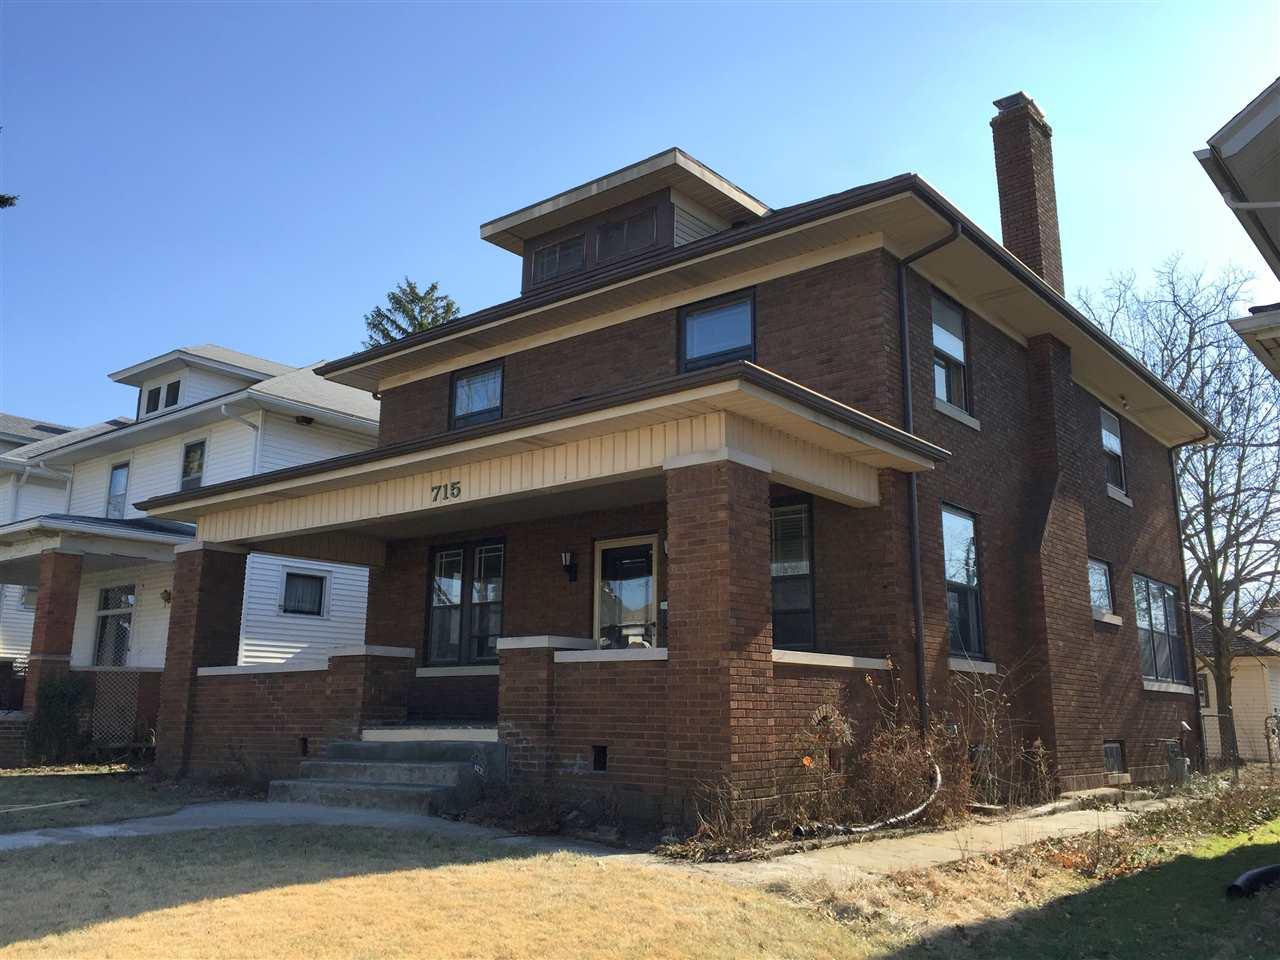 715 W Wildwood, Fort Wayne, IN 46807